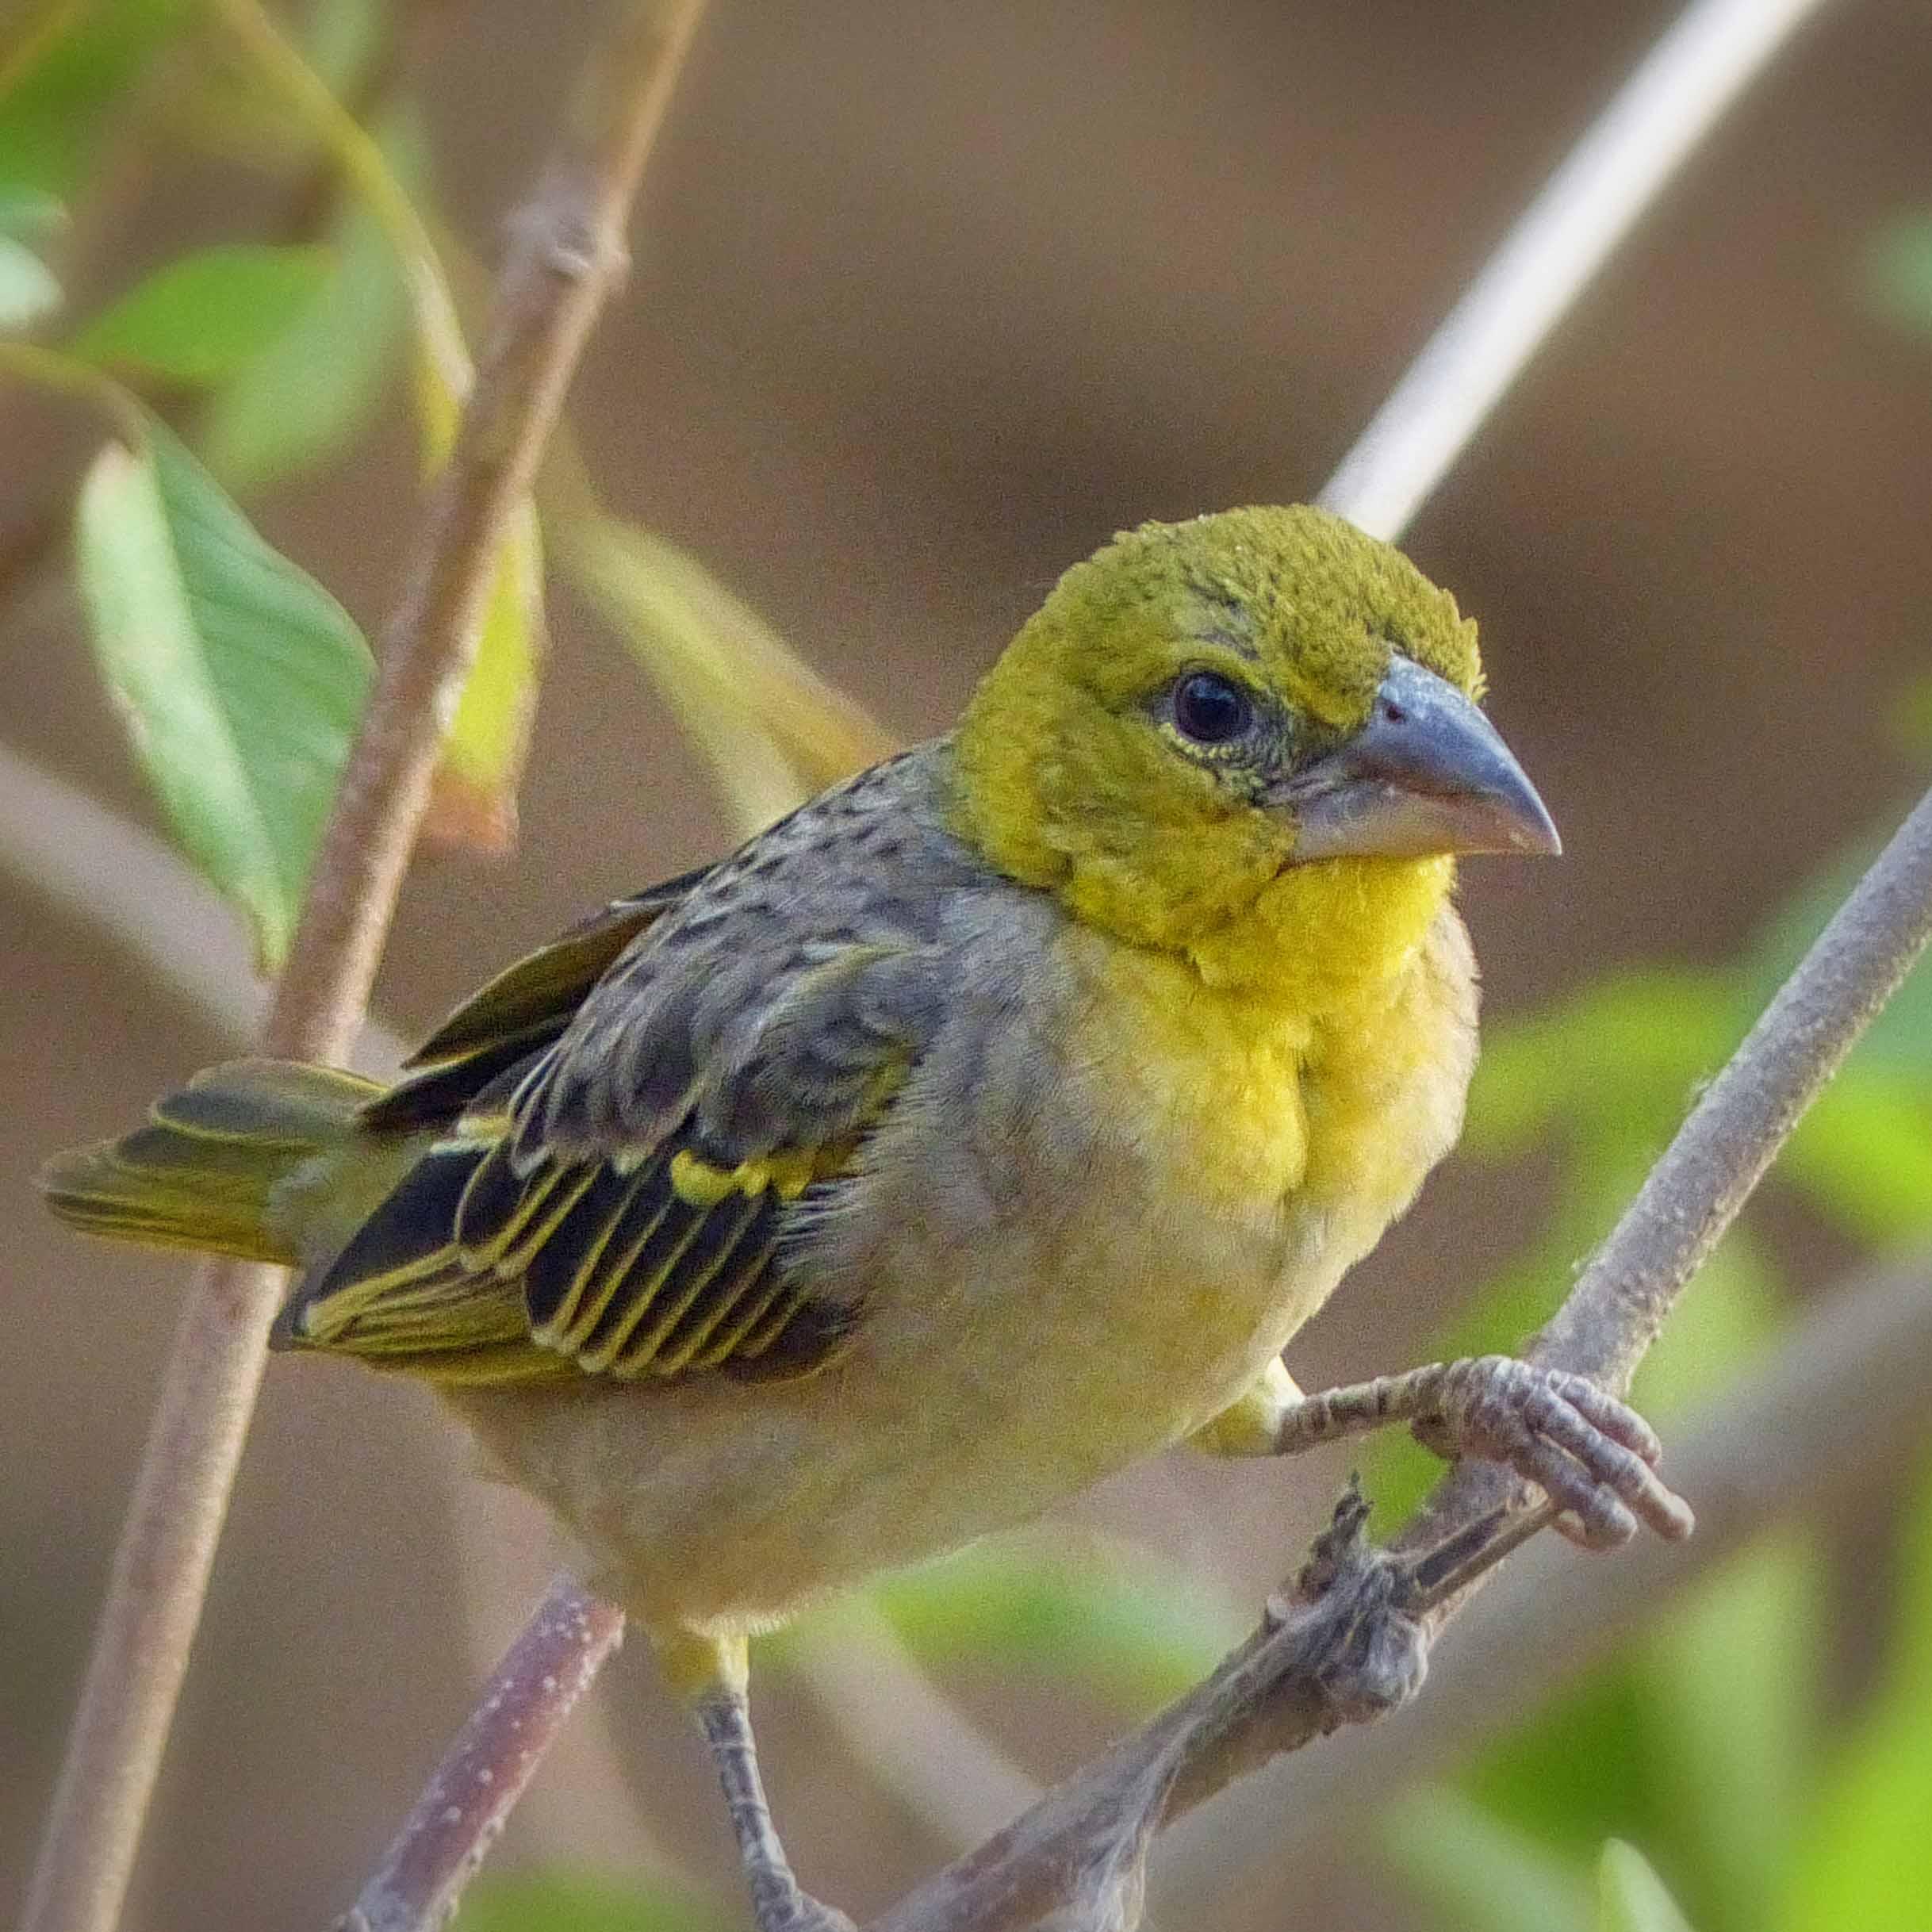 Small yellow bird in a bush